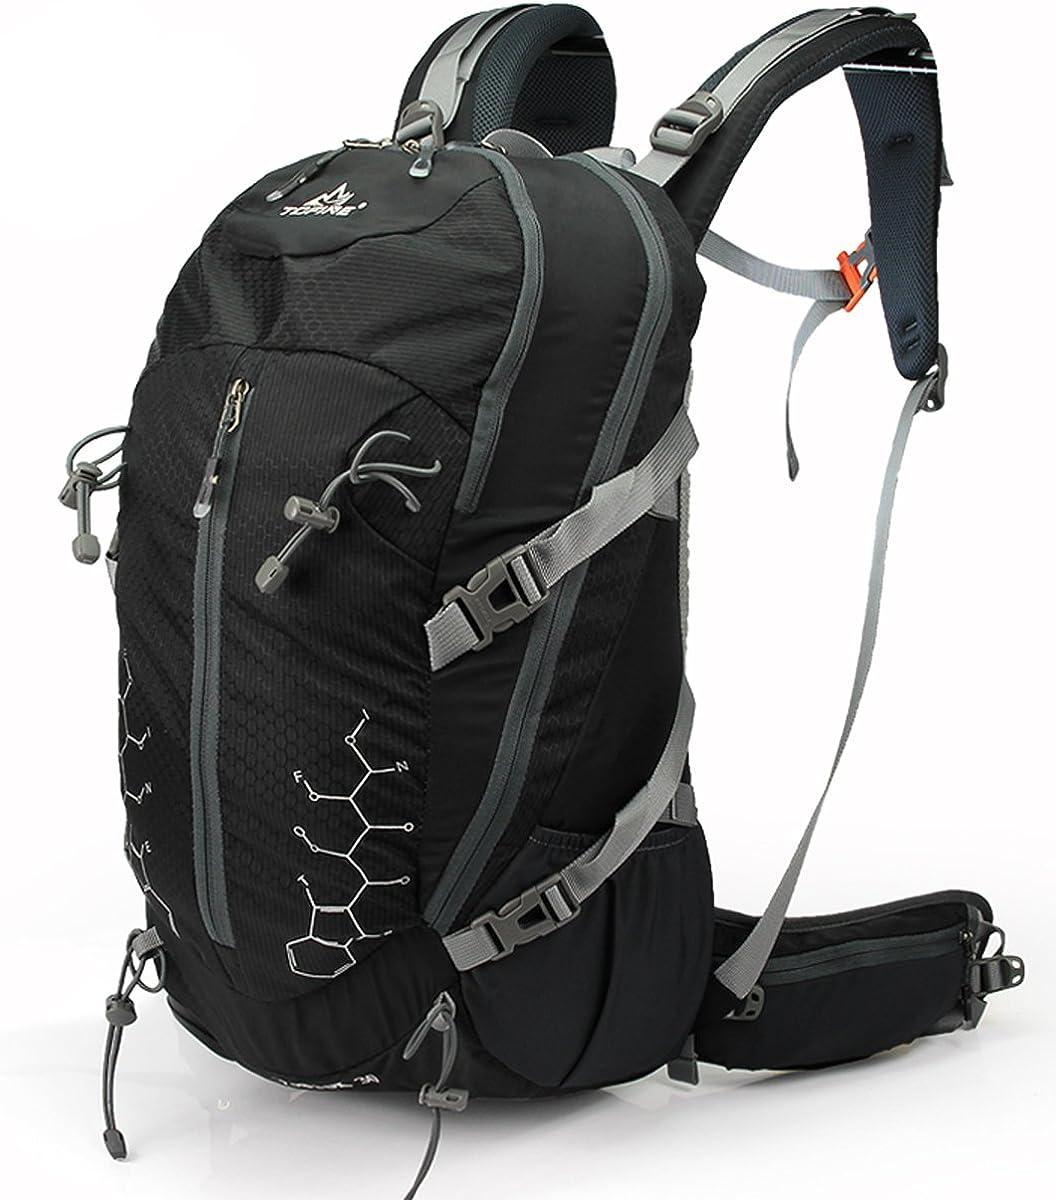 TOFINE Backpack Lightweight Daypack Waterproof for Trekking travel Internal Frame Backpacks 30L